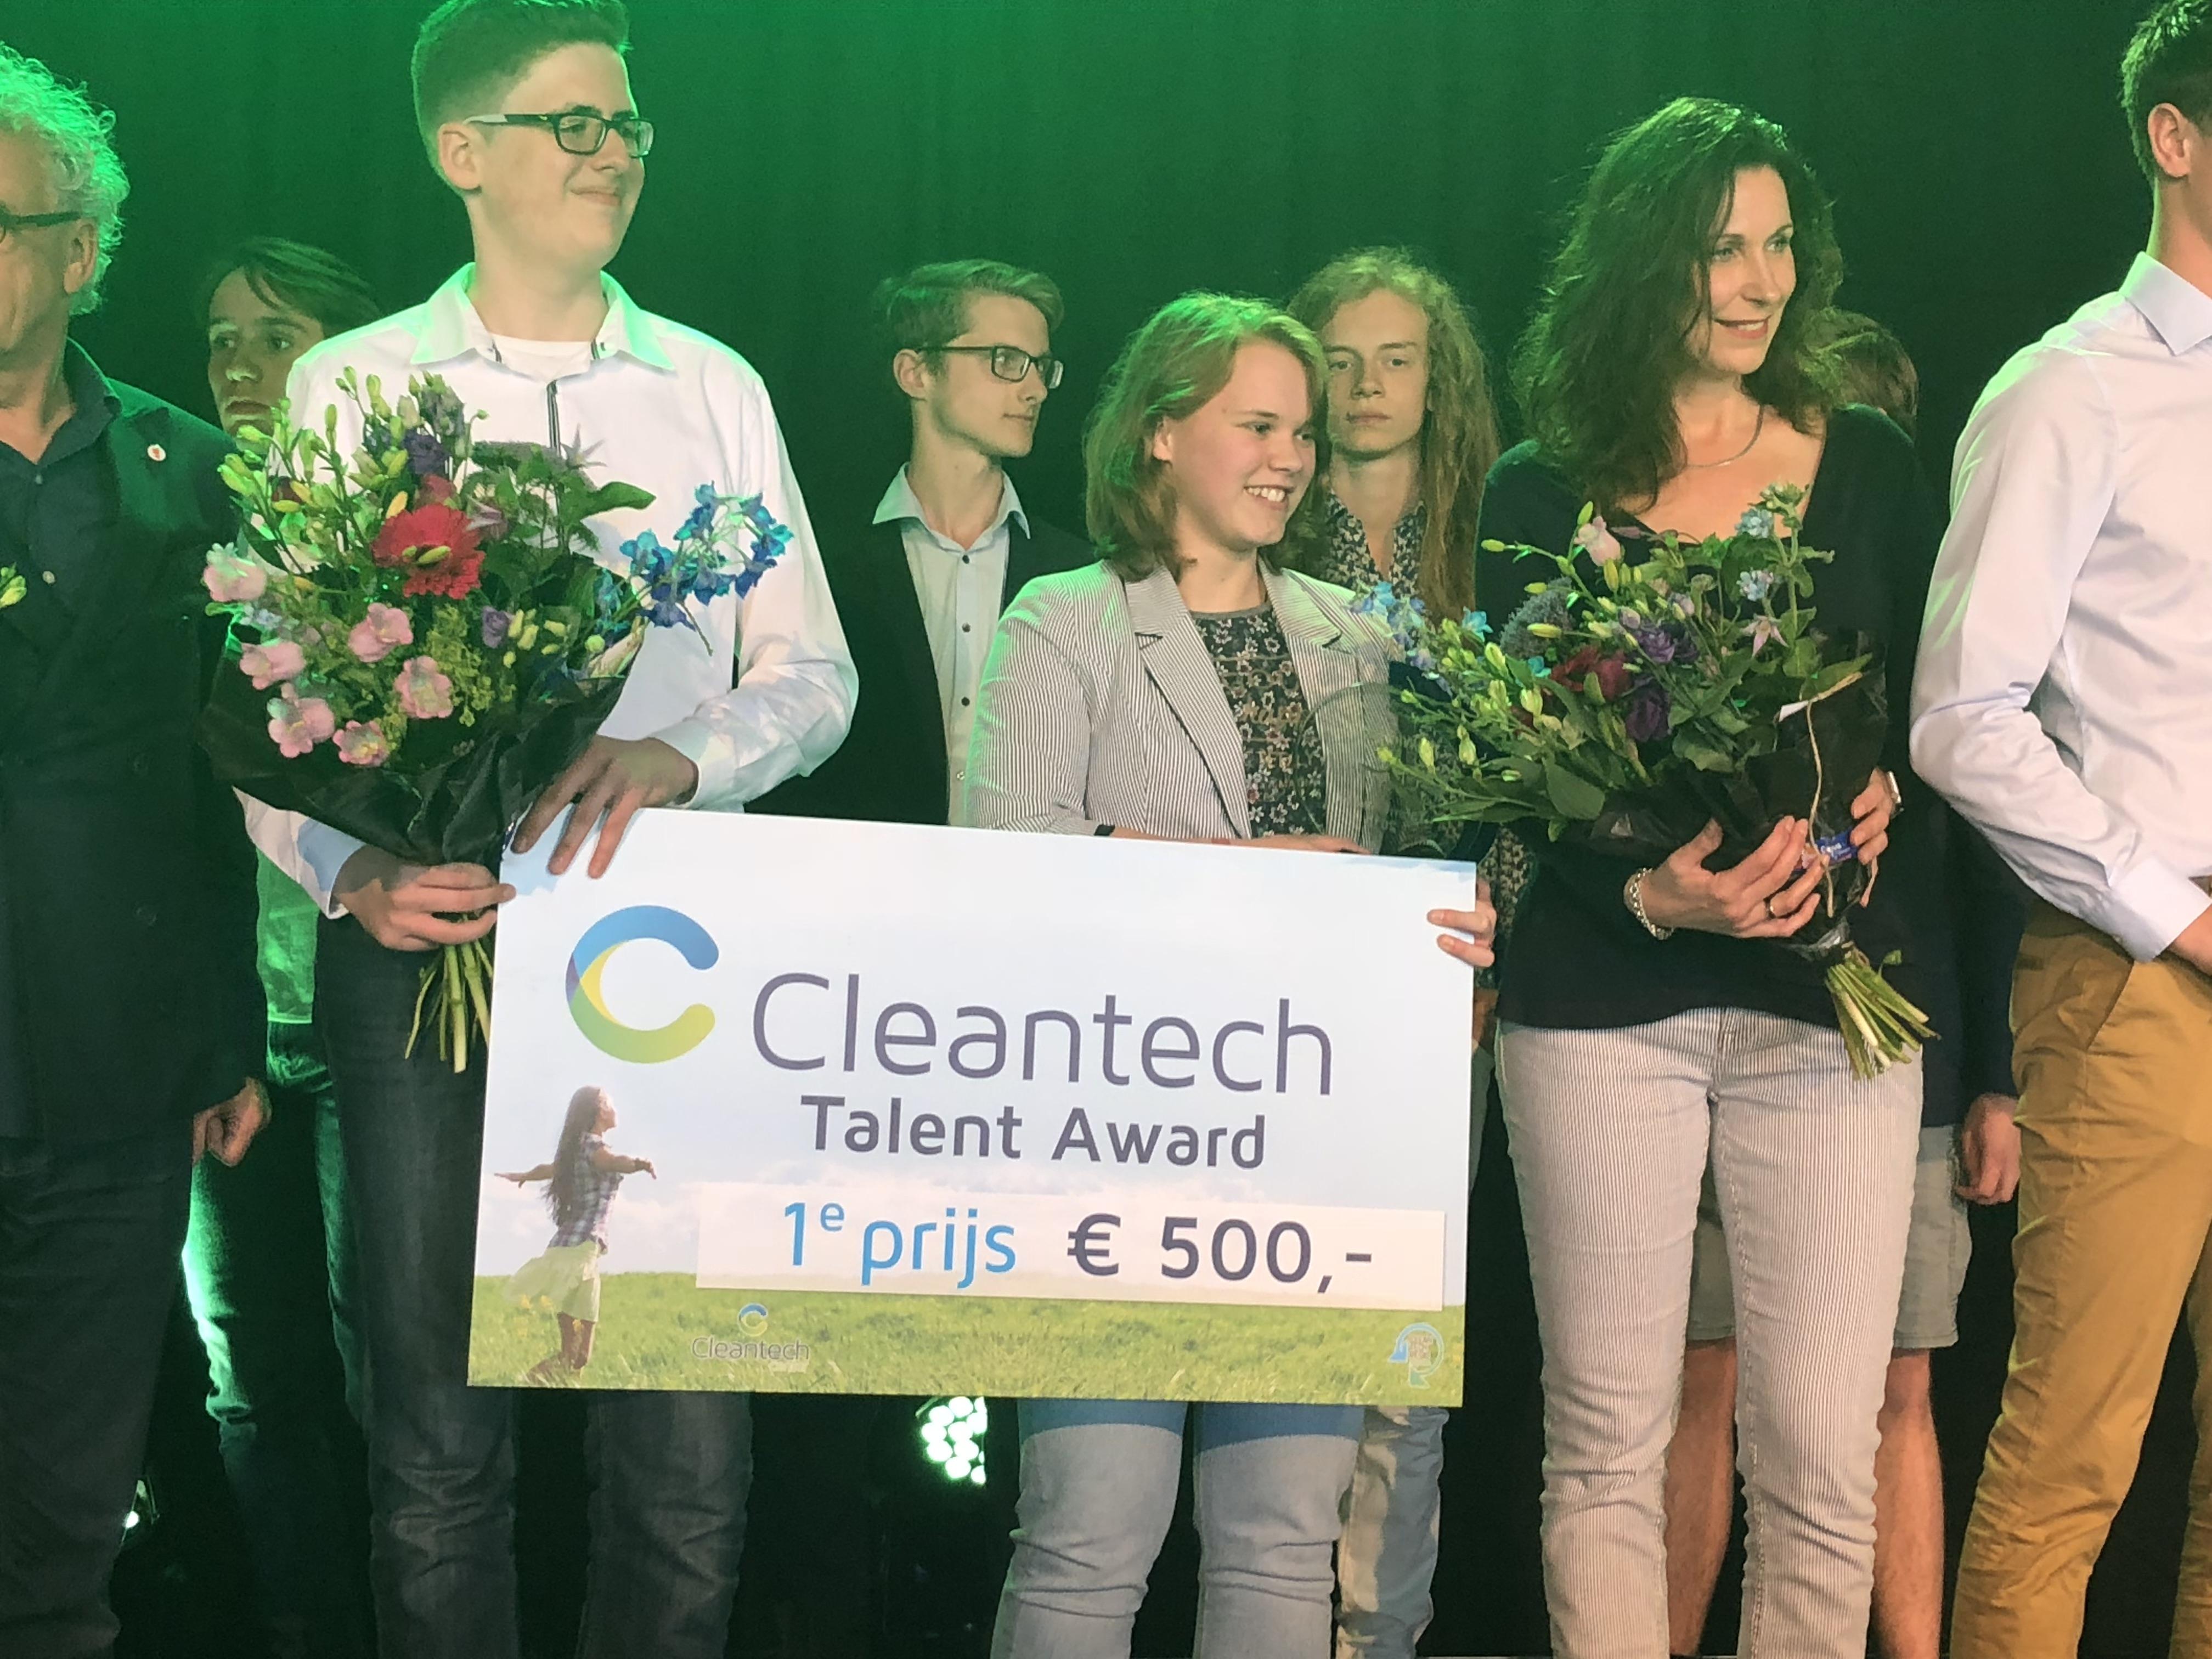 Het Stedelijk wint Cleantech Talent Award 2018